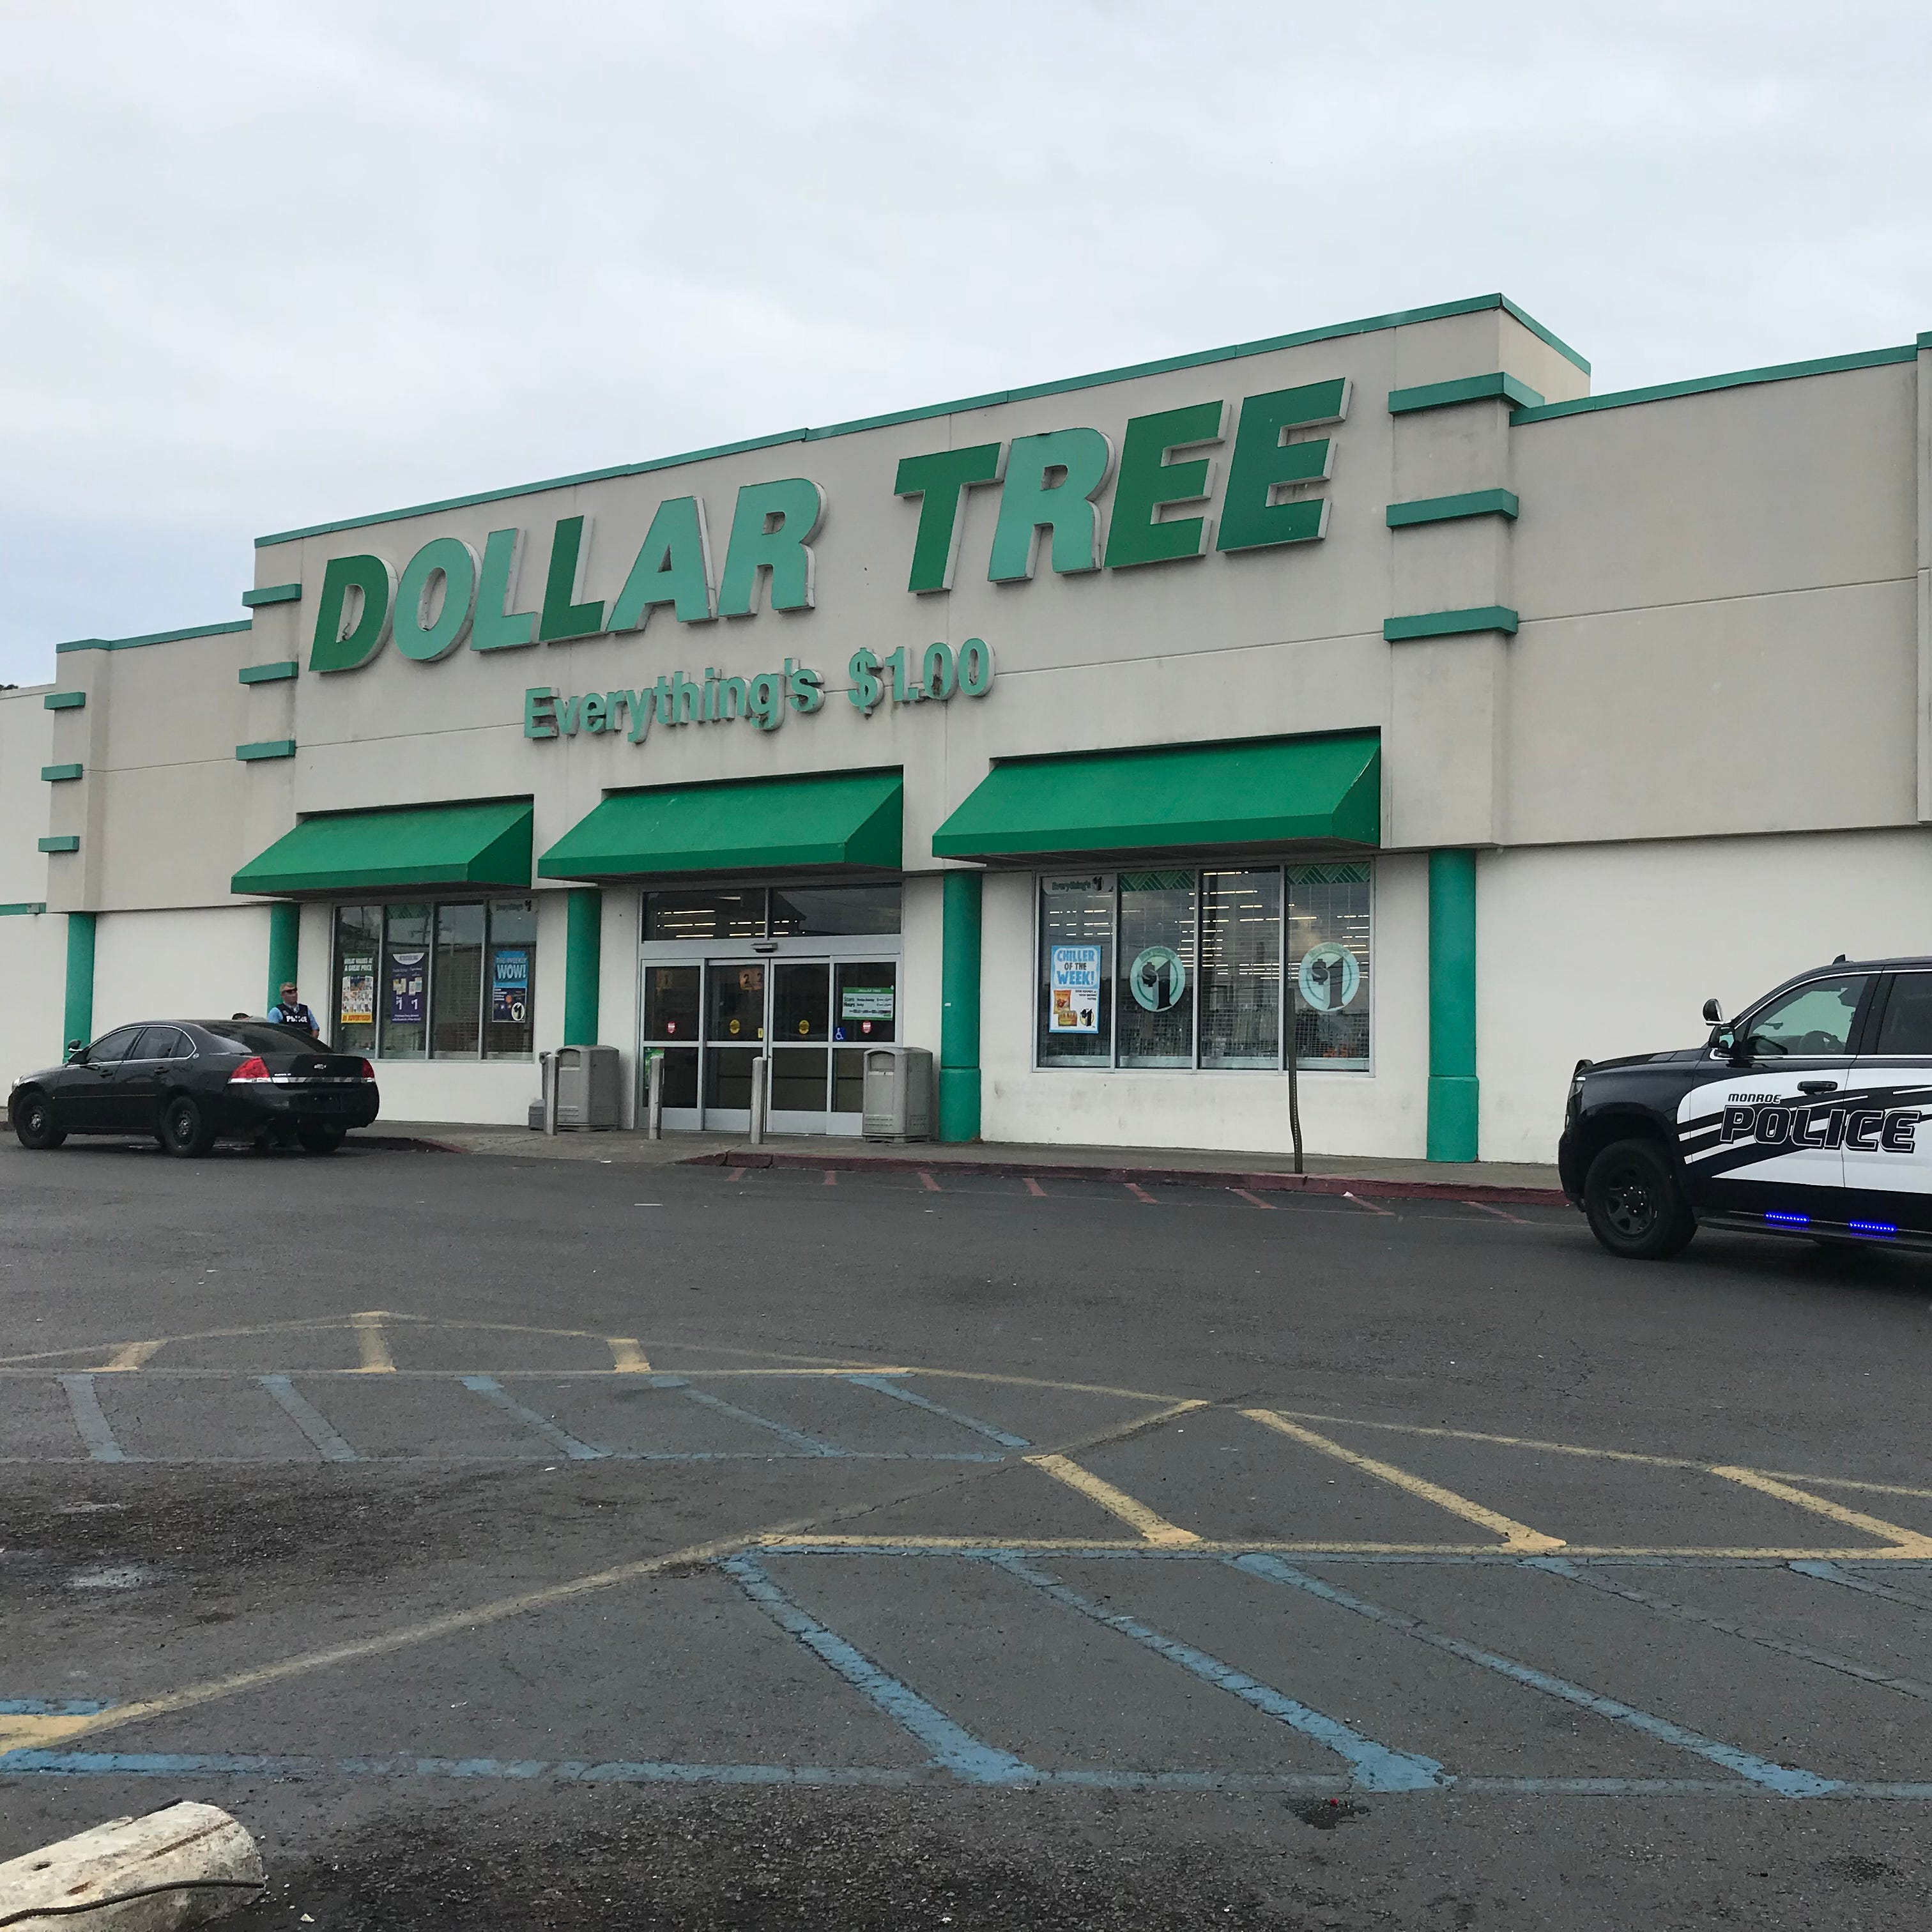 MPD: Homeless man shot Dollar Tree worker, remains at large